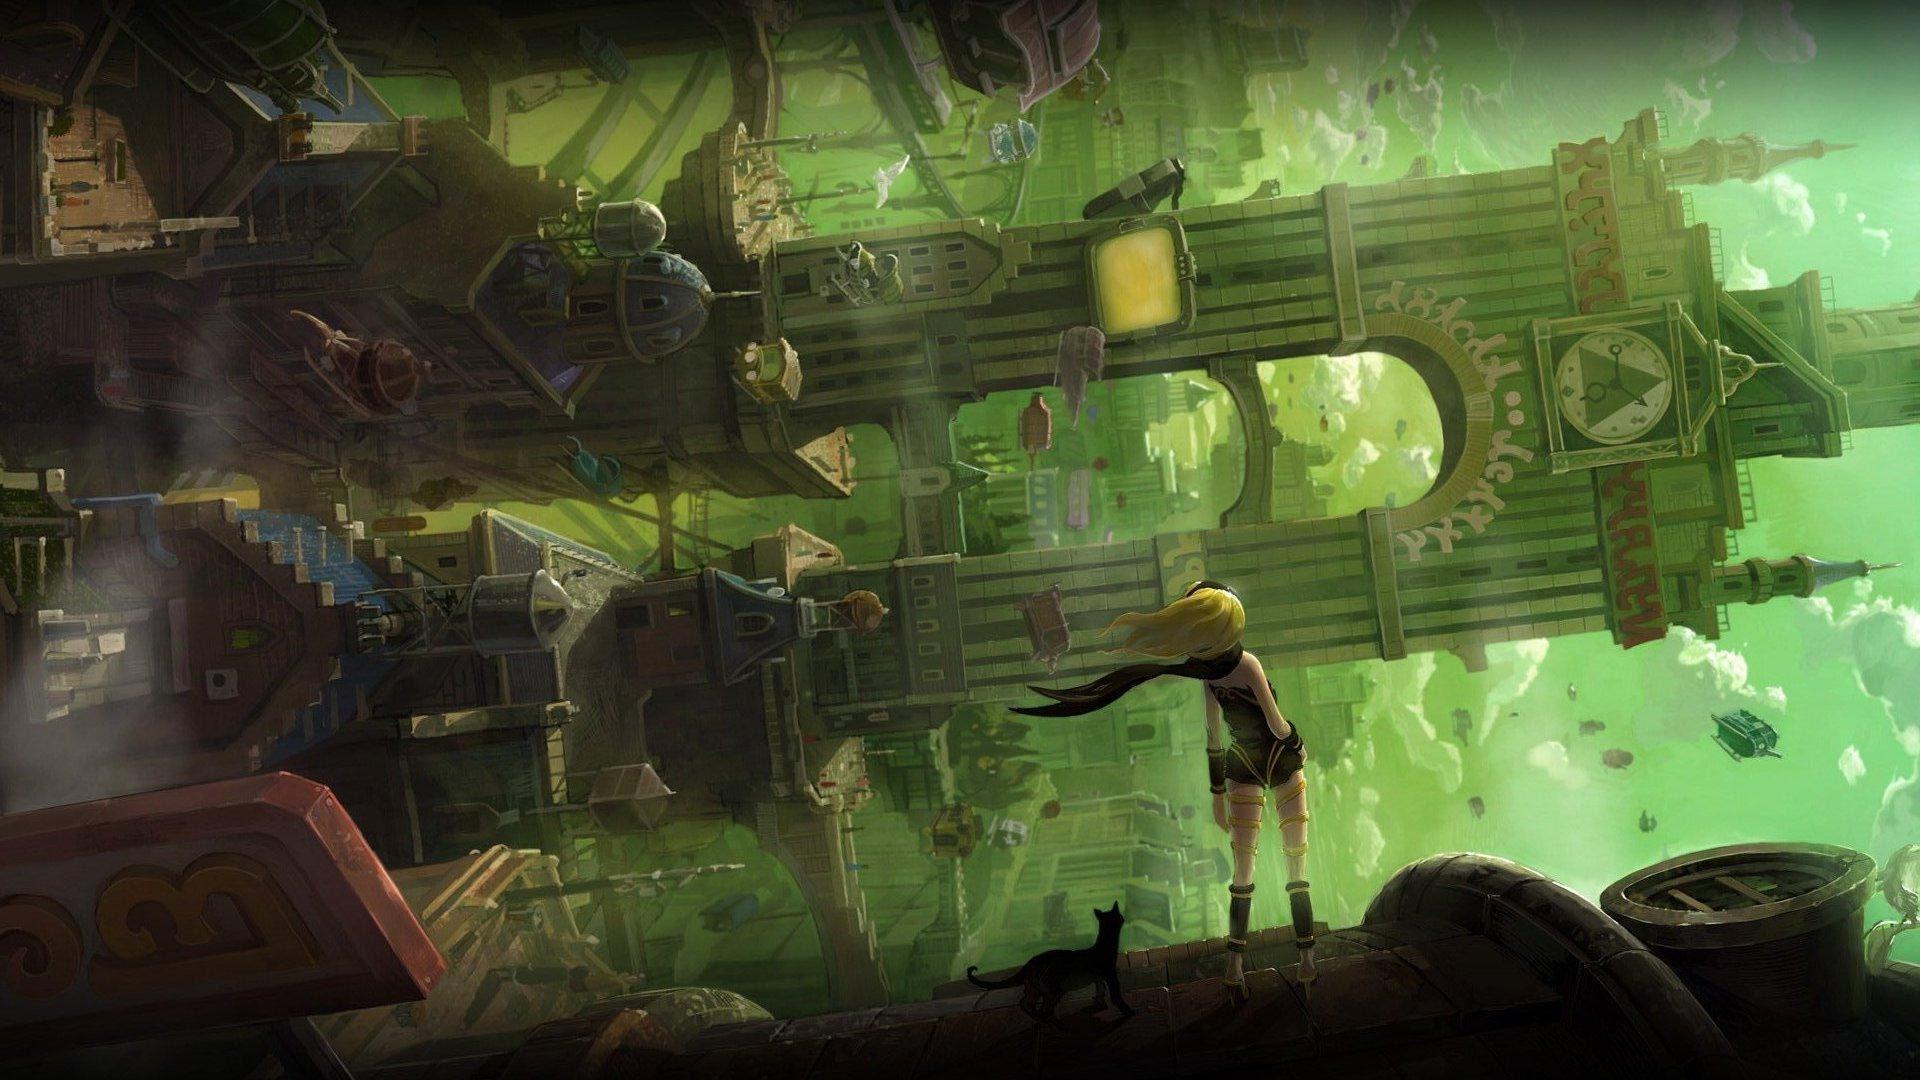 Gravity Rush HD wallpapers, Desktop wallpaper - most viewed